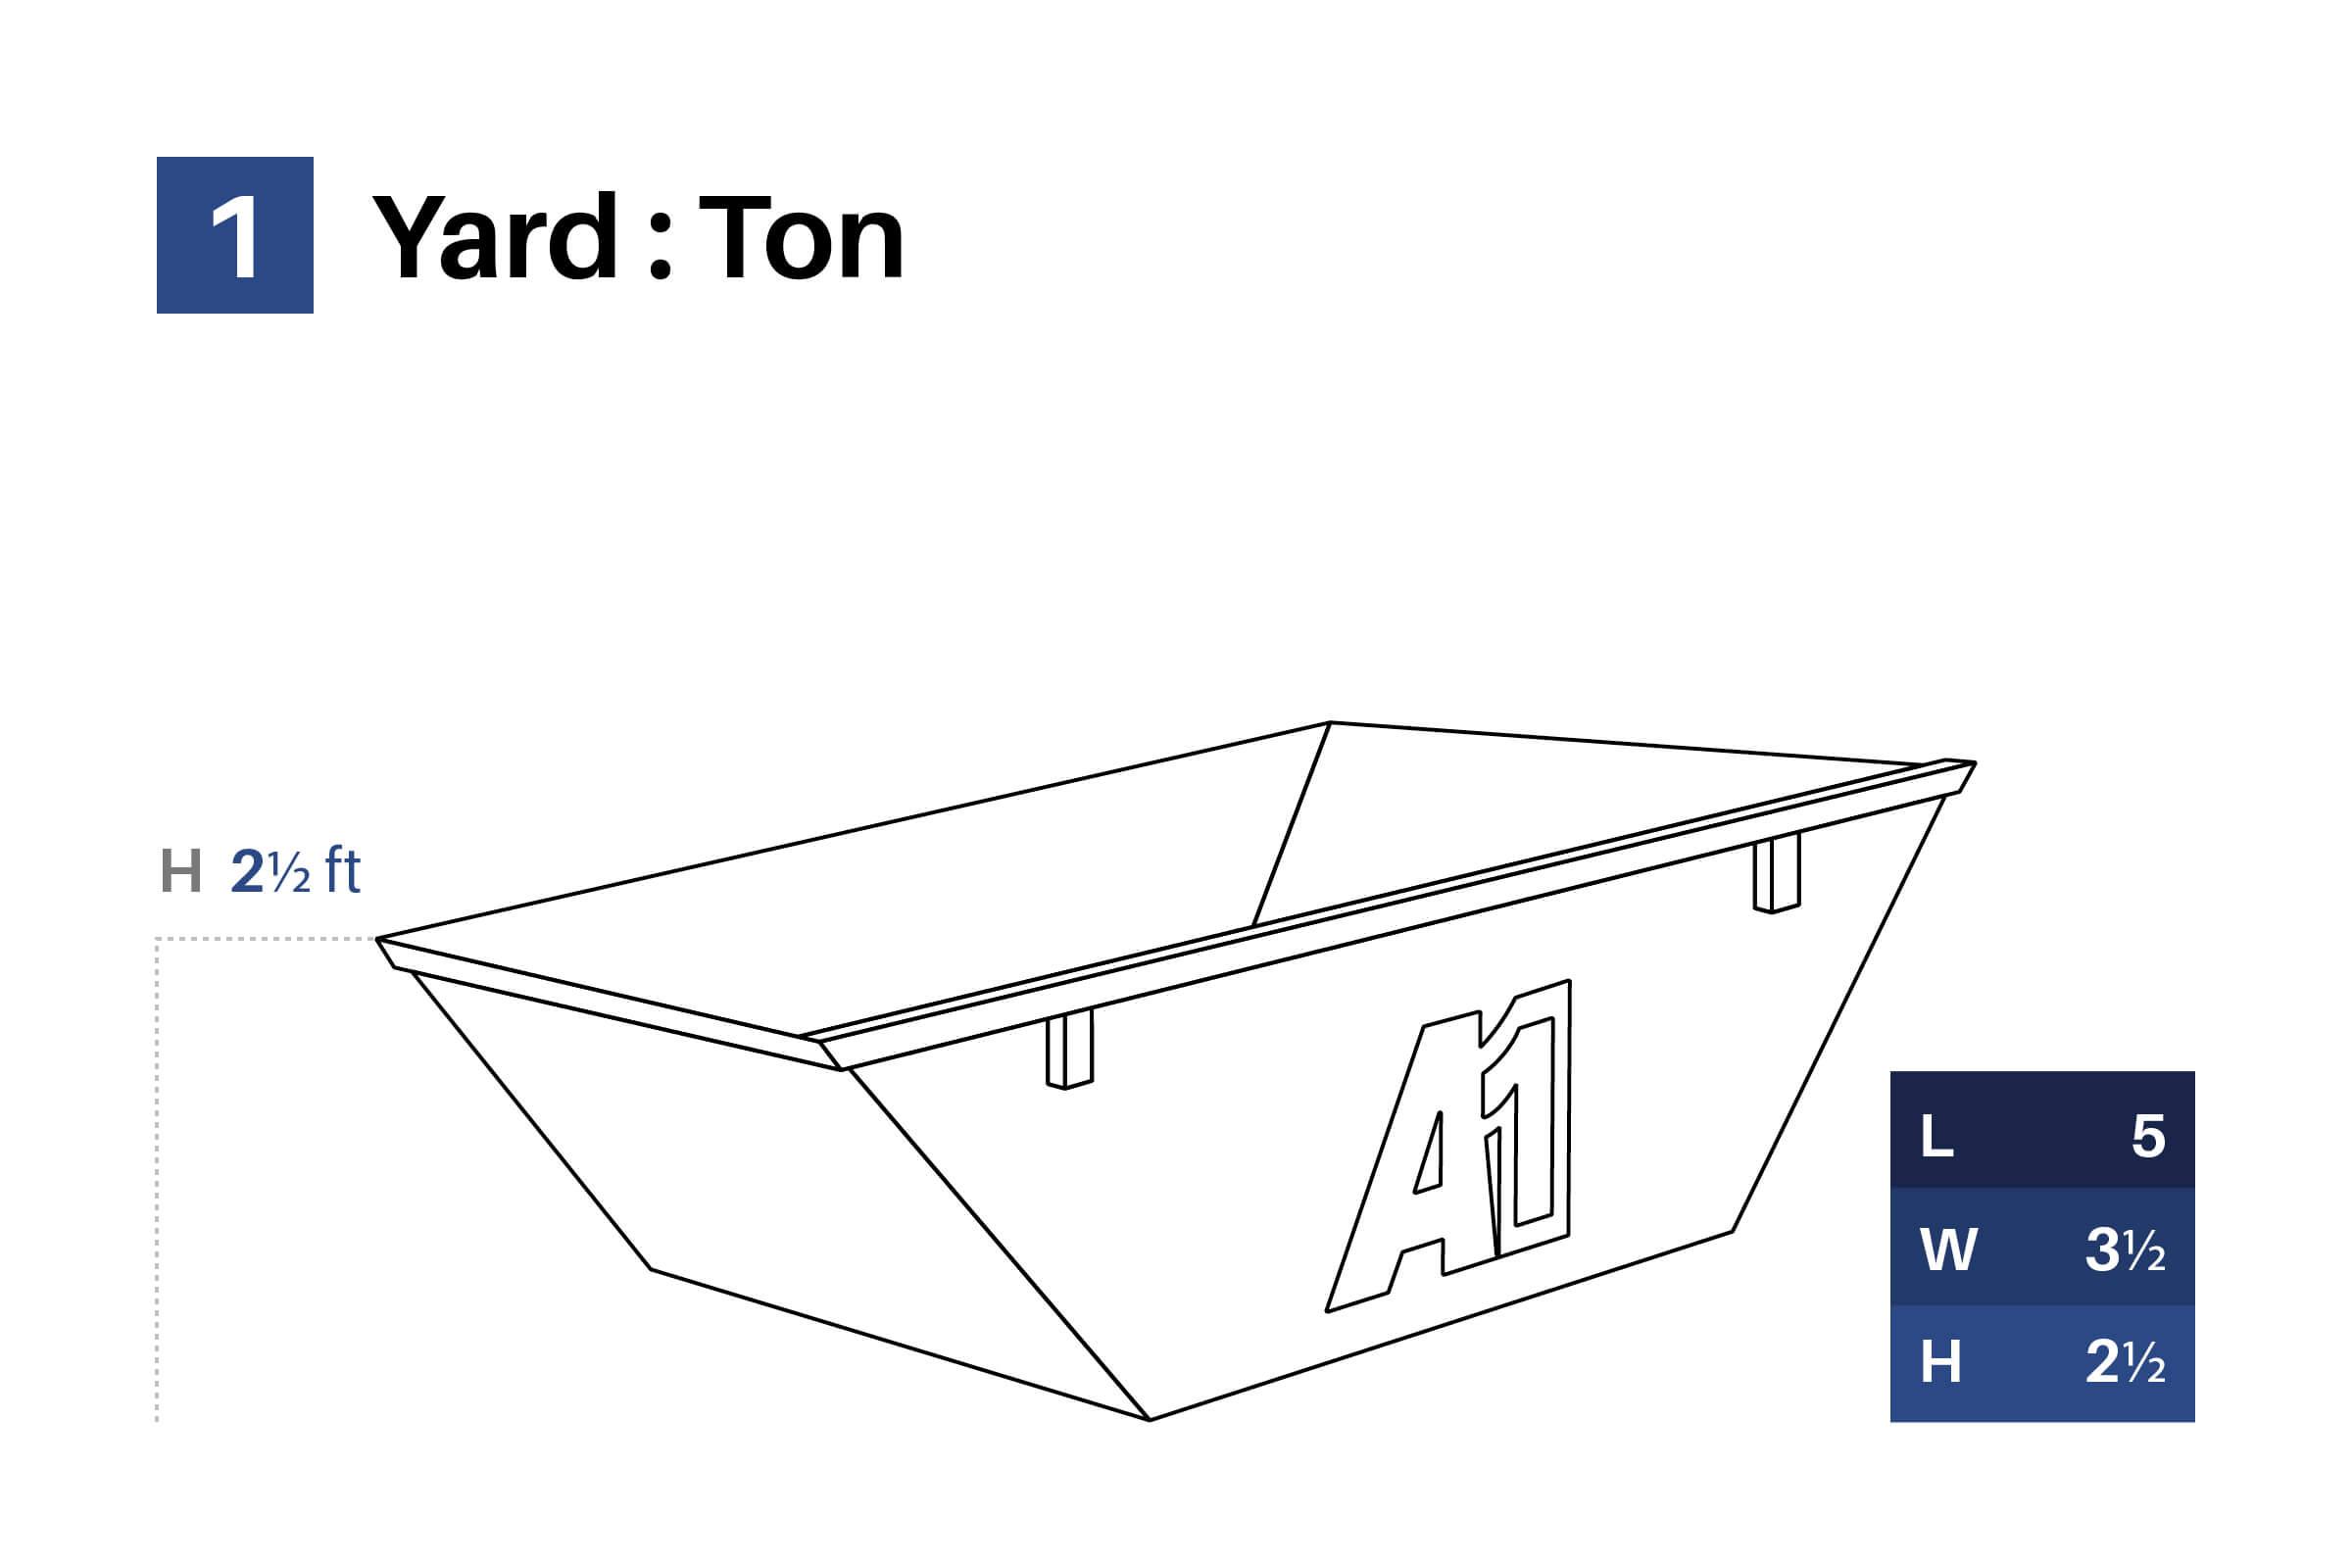 a1skip-hire-1yard